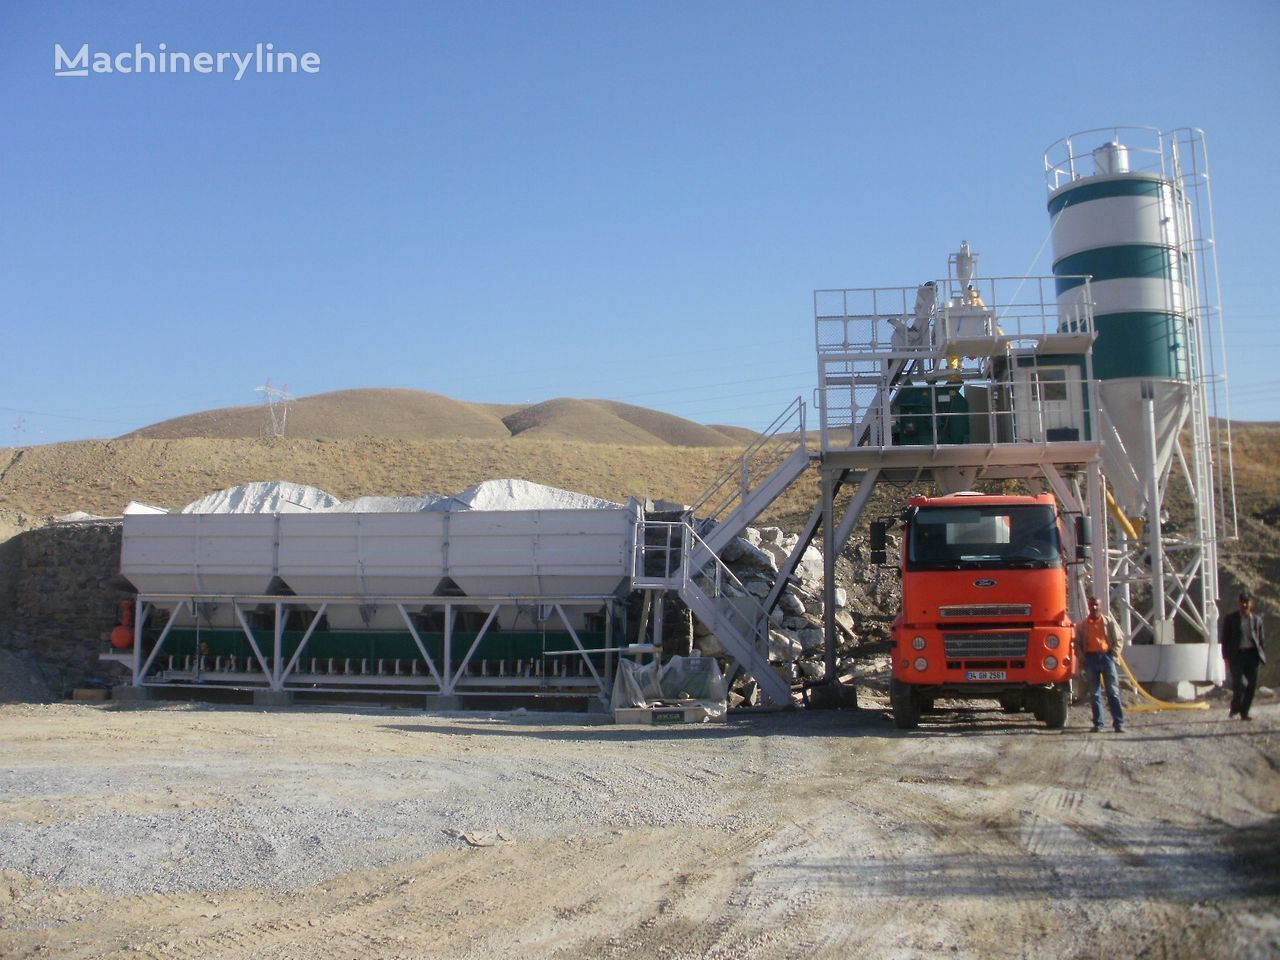 SEMIX KOMPAKTNE BETONARE planta de hormigón nueva